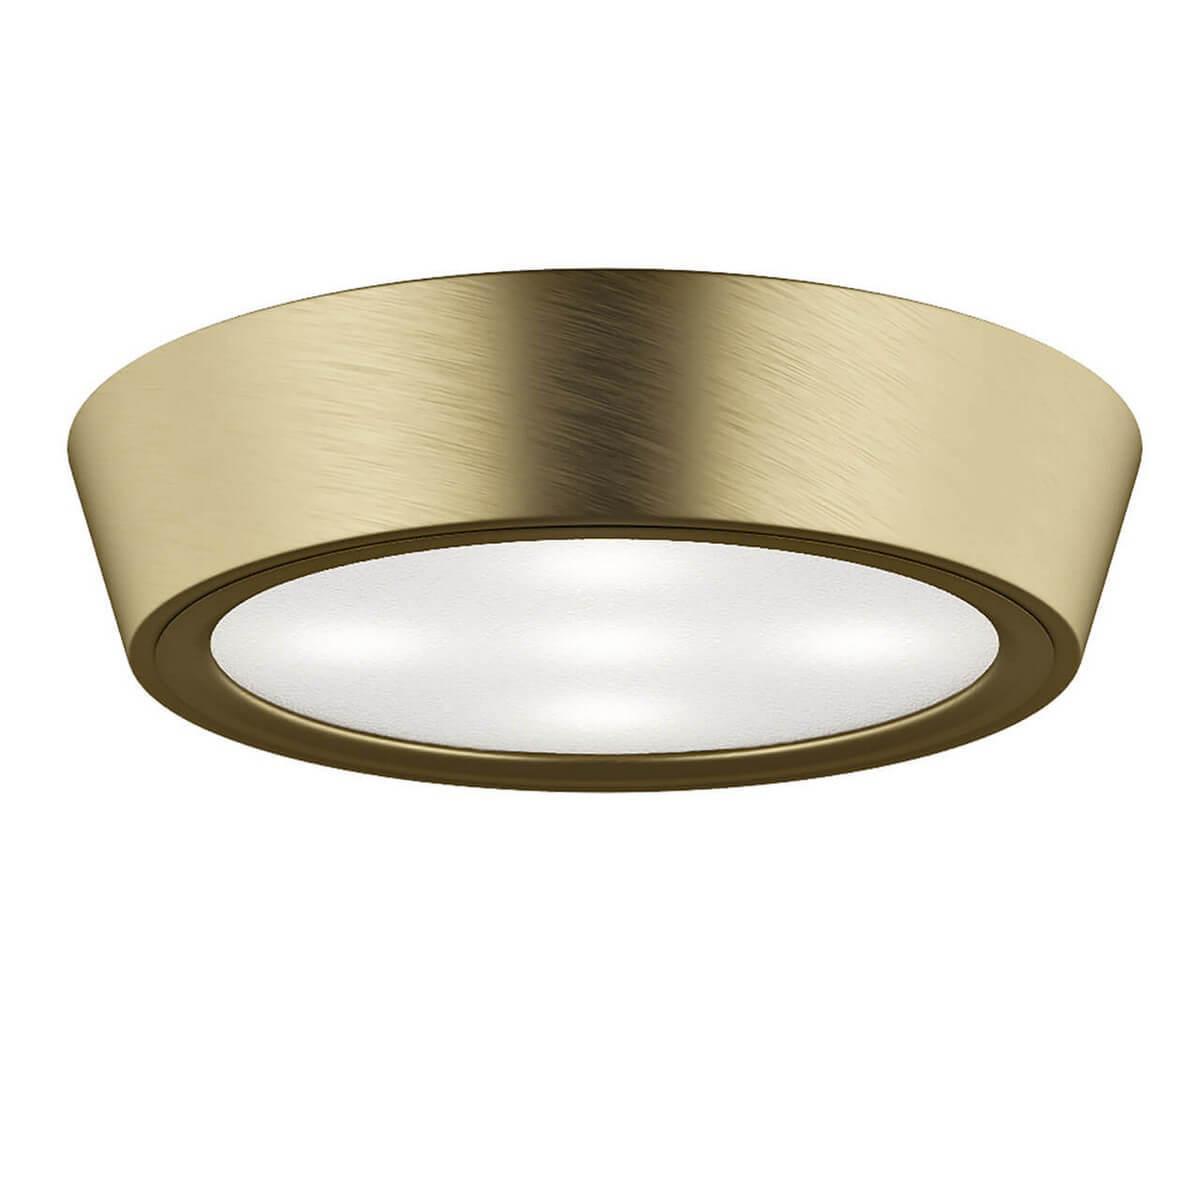 Накладной светильник Lightstar 214712, LED, 1 Вт цена